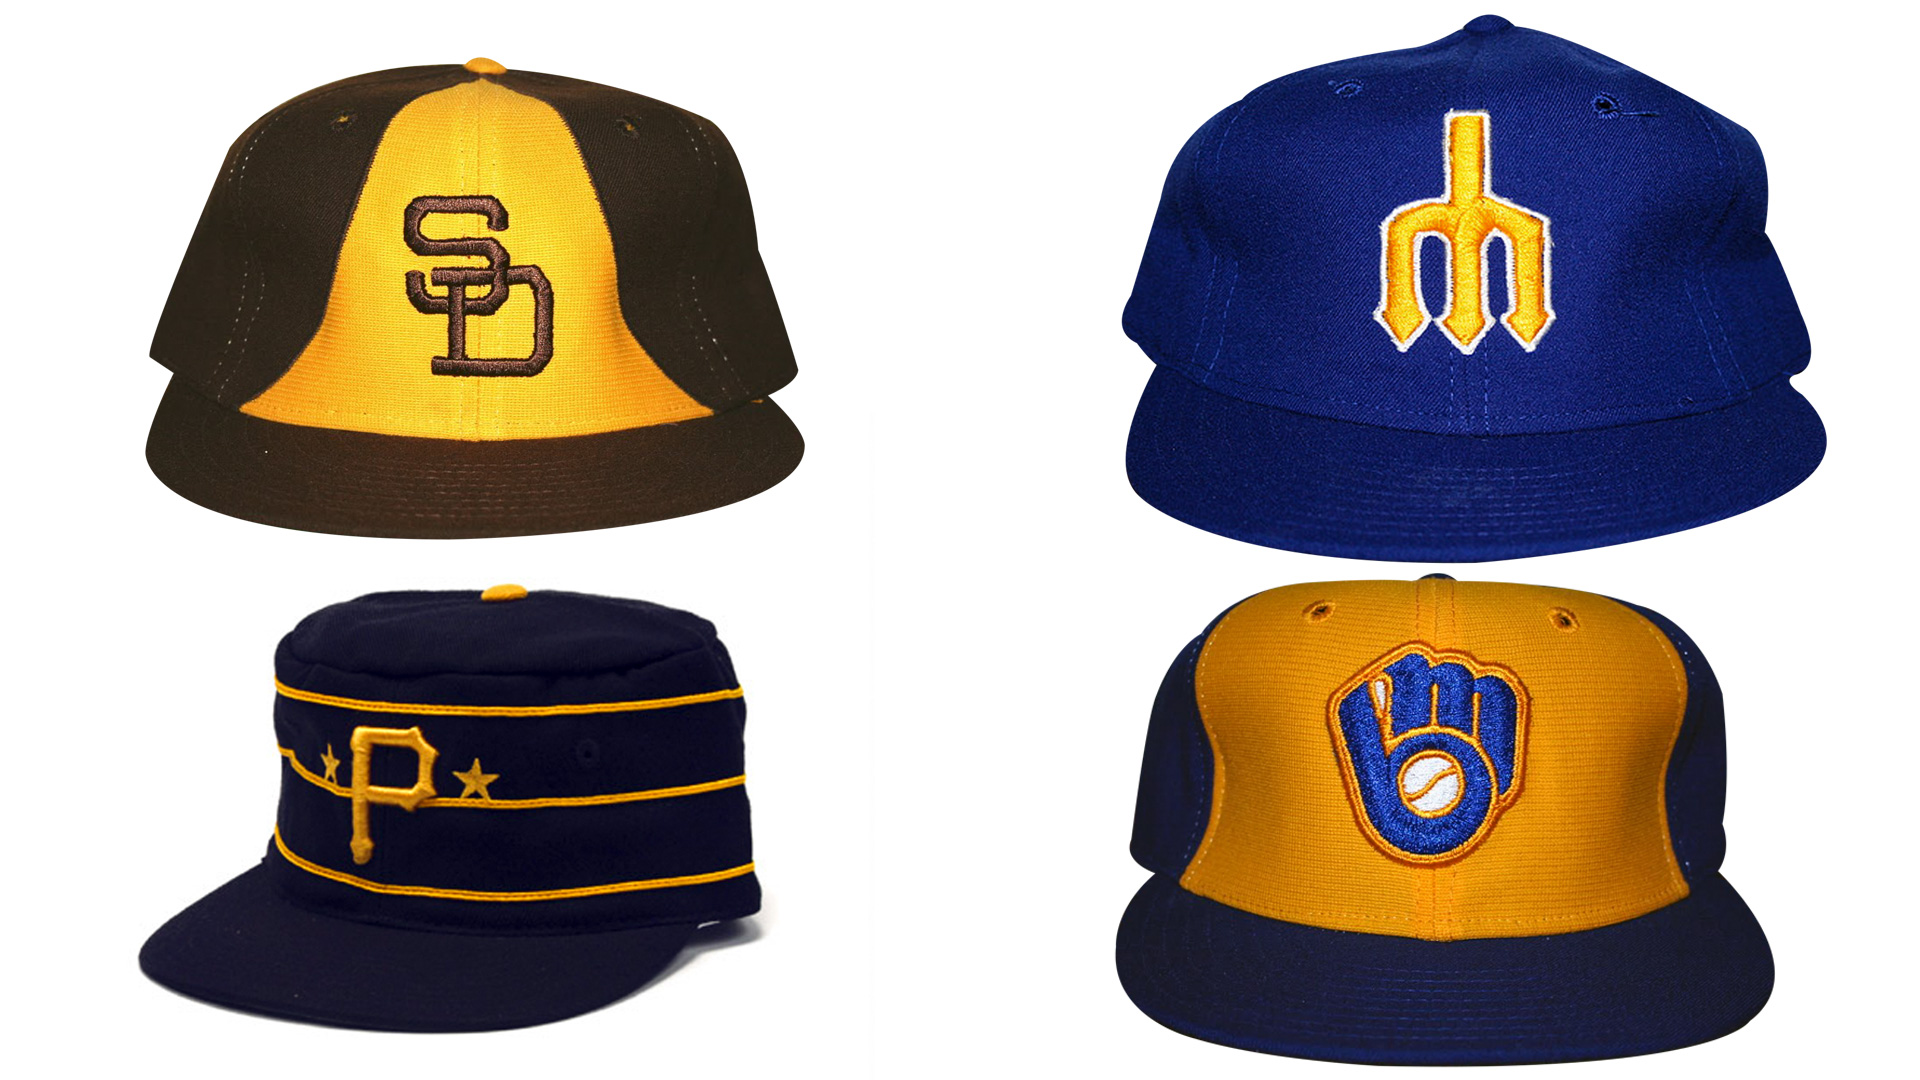 1970s baseball caps